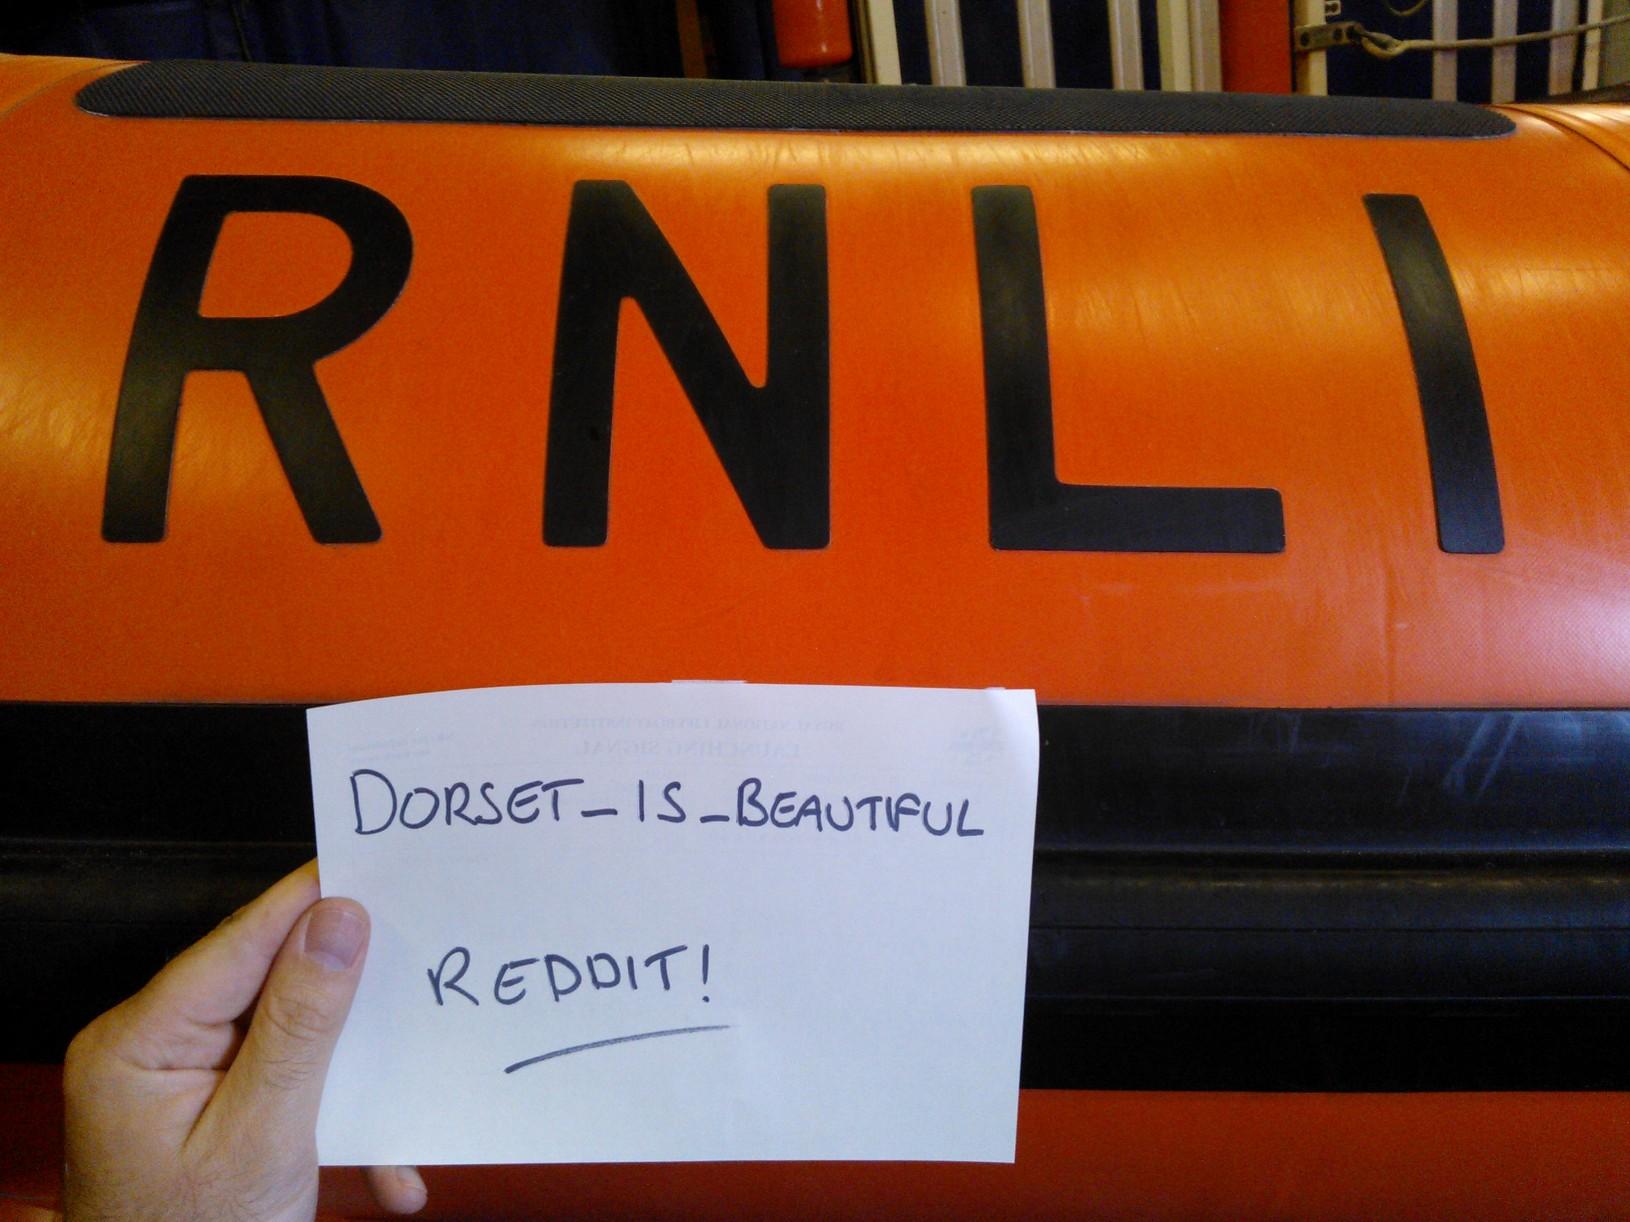 Reddit Proof